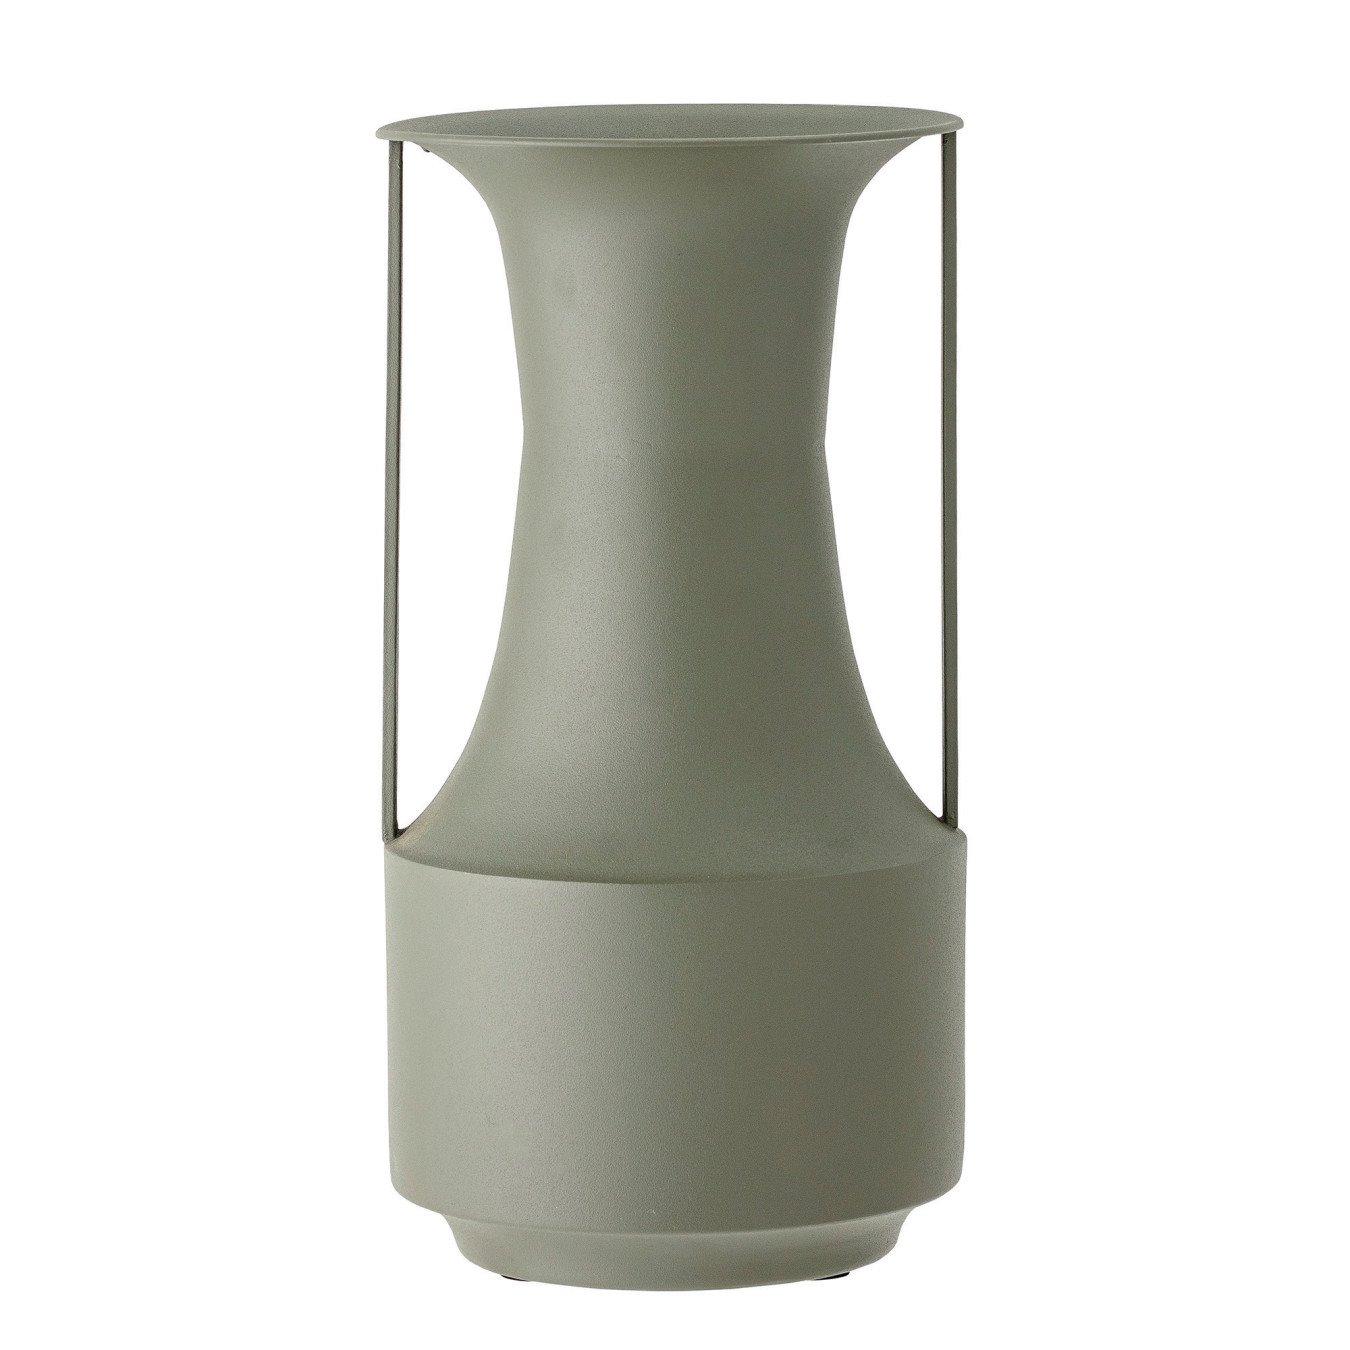 Matte Green Finish Textured Metal Vase w/ Handles